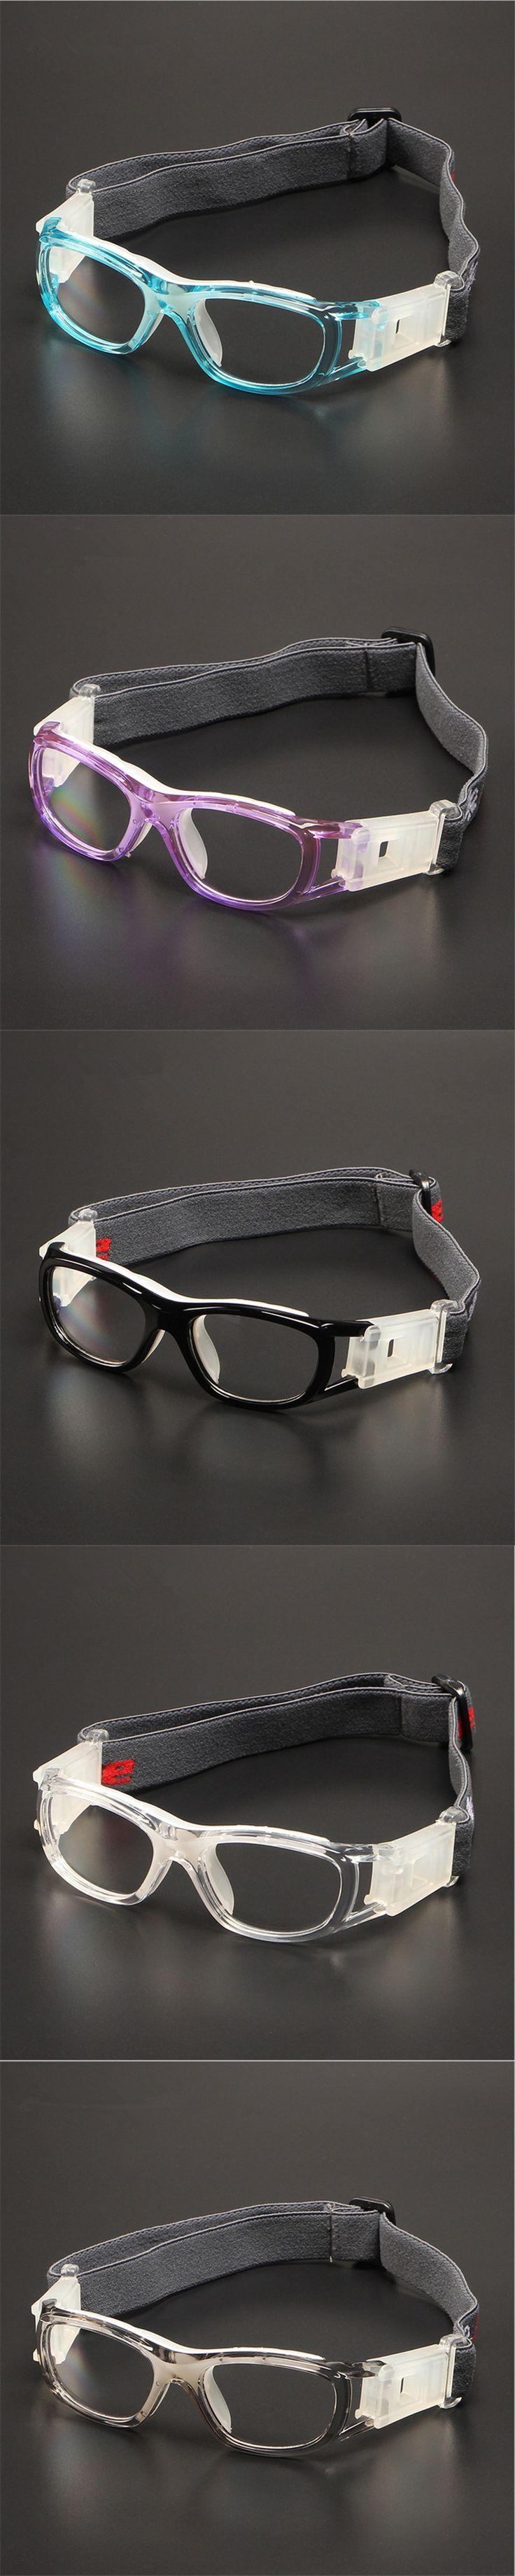 Sports glasses Basketball glasses Prescription glass frame football Protective eye Outdoor custom optical frame dx030